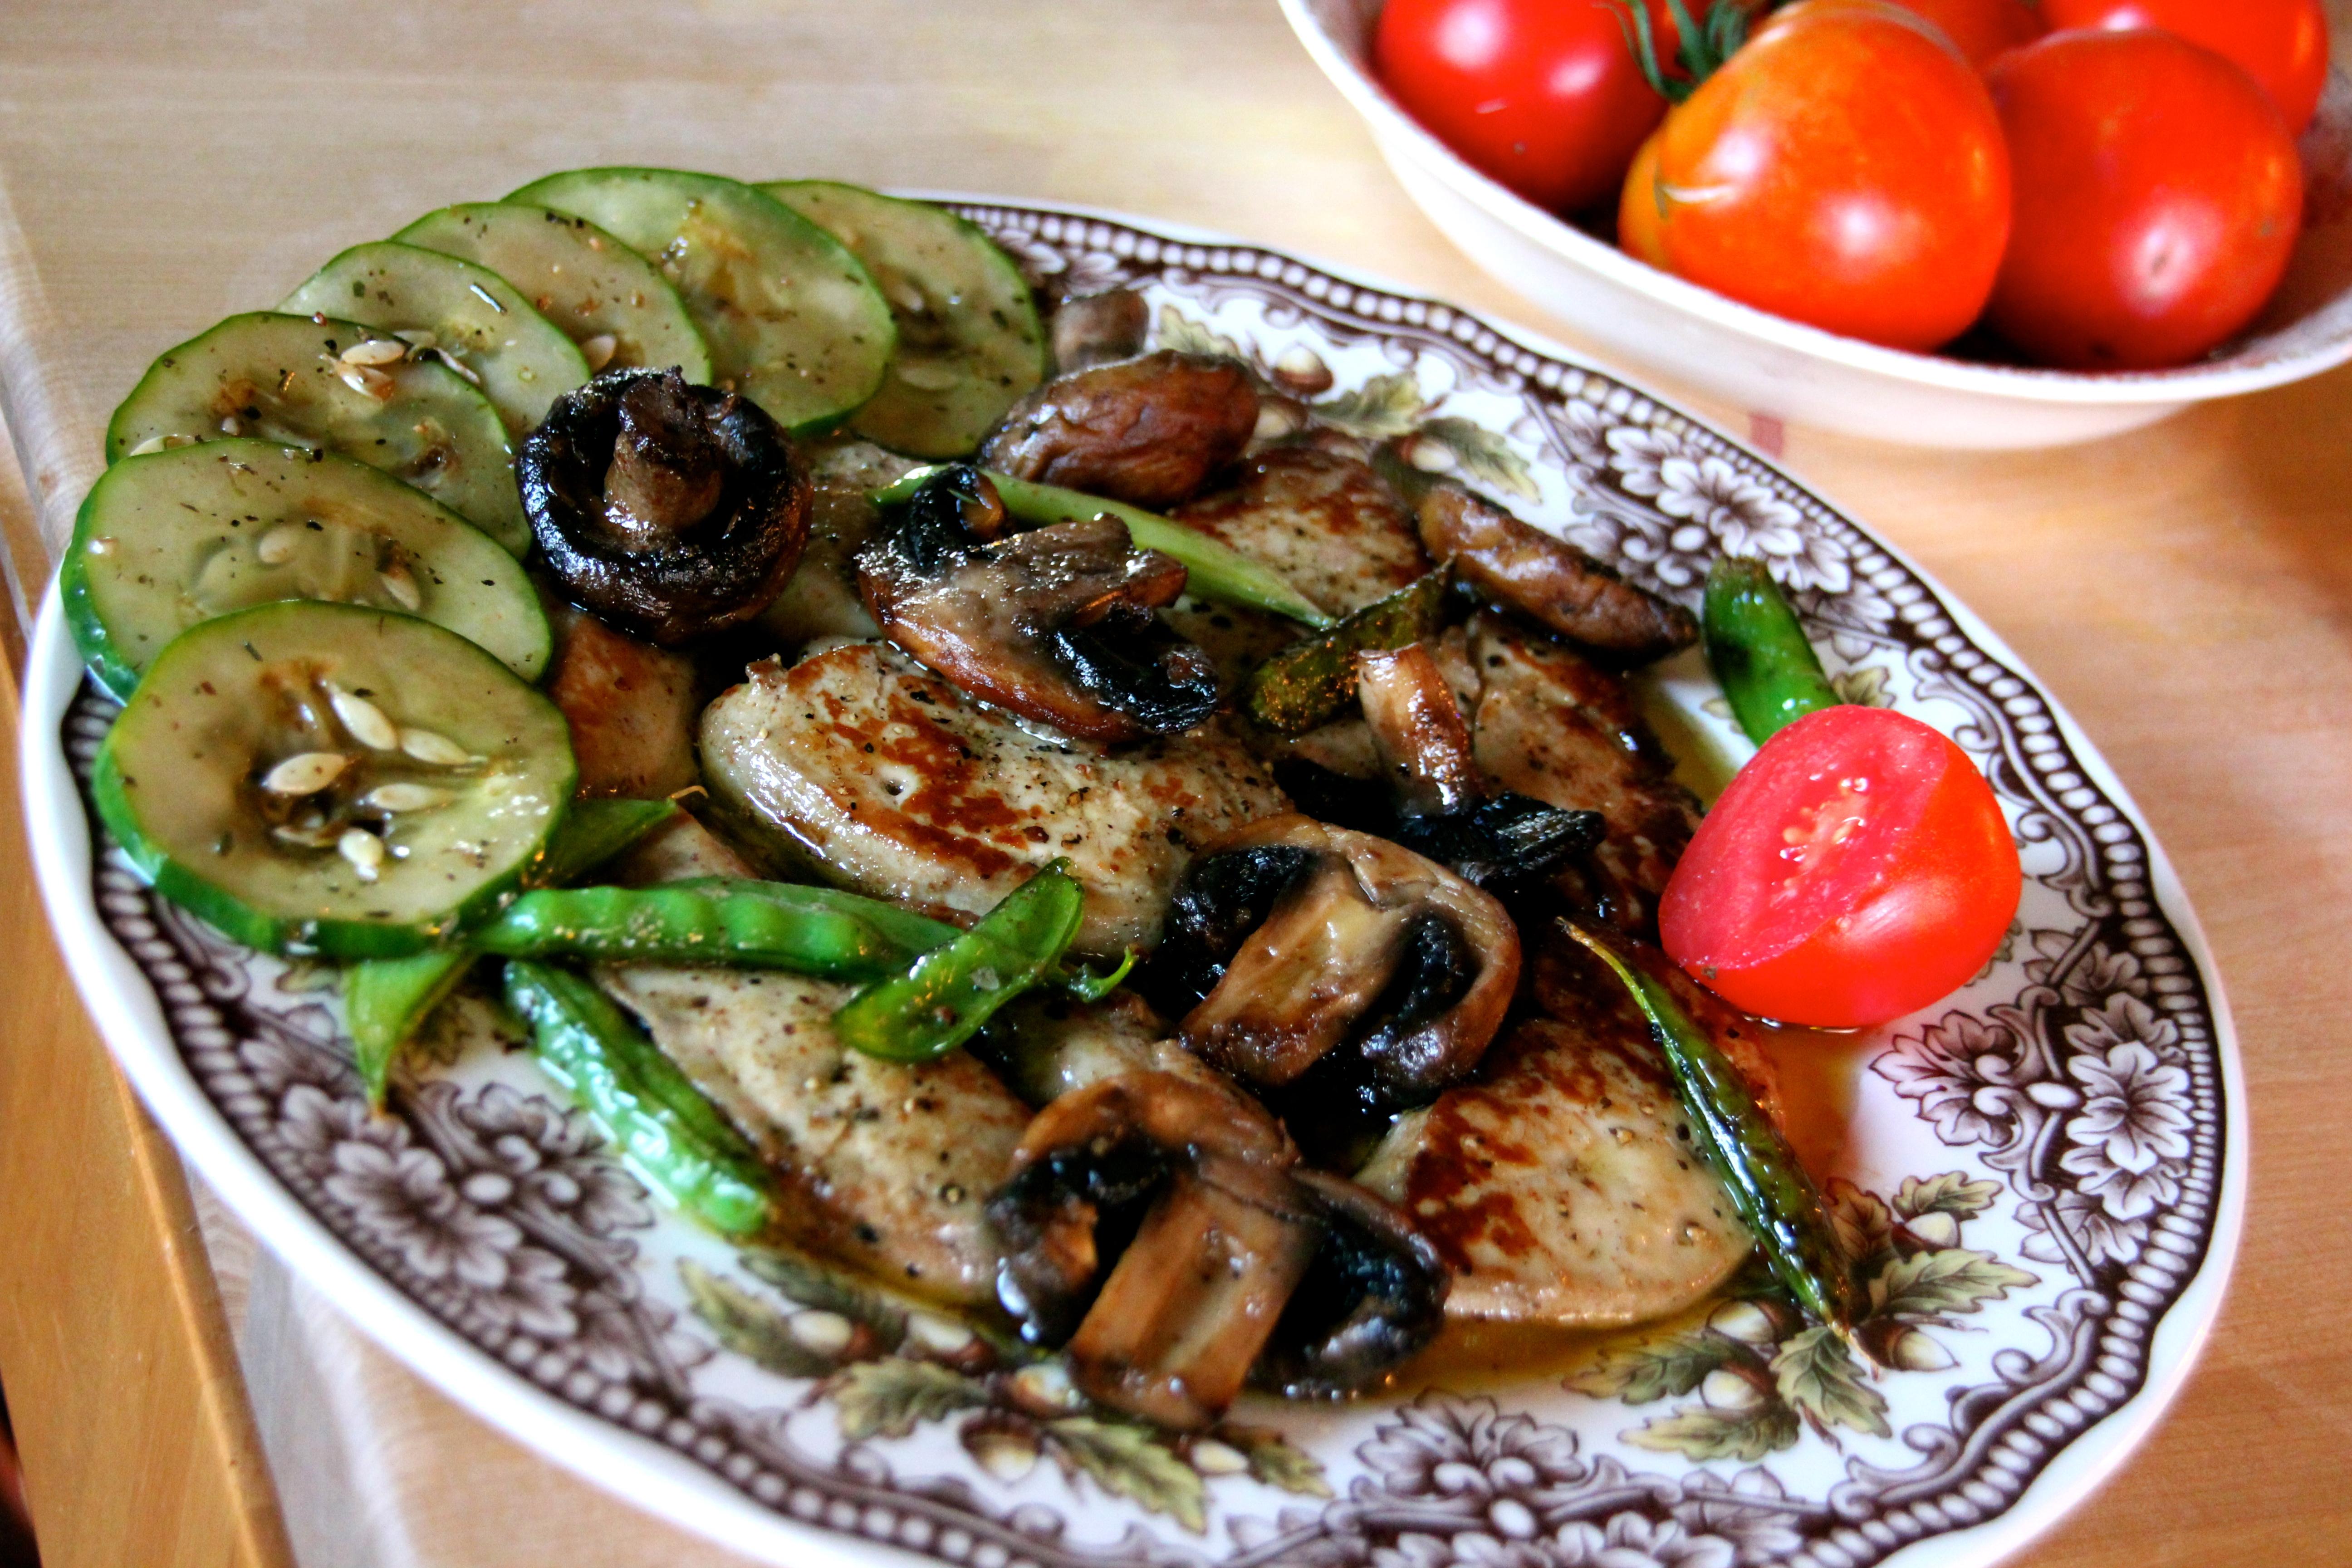 Foie Gras, French cuisine